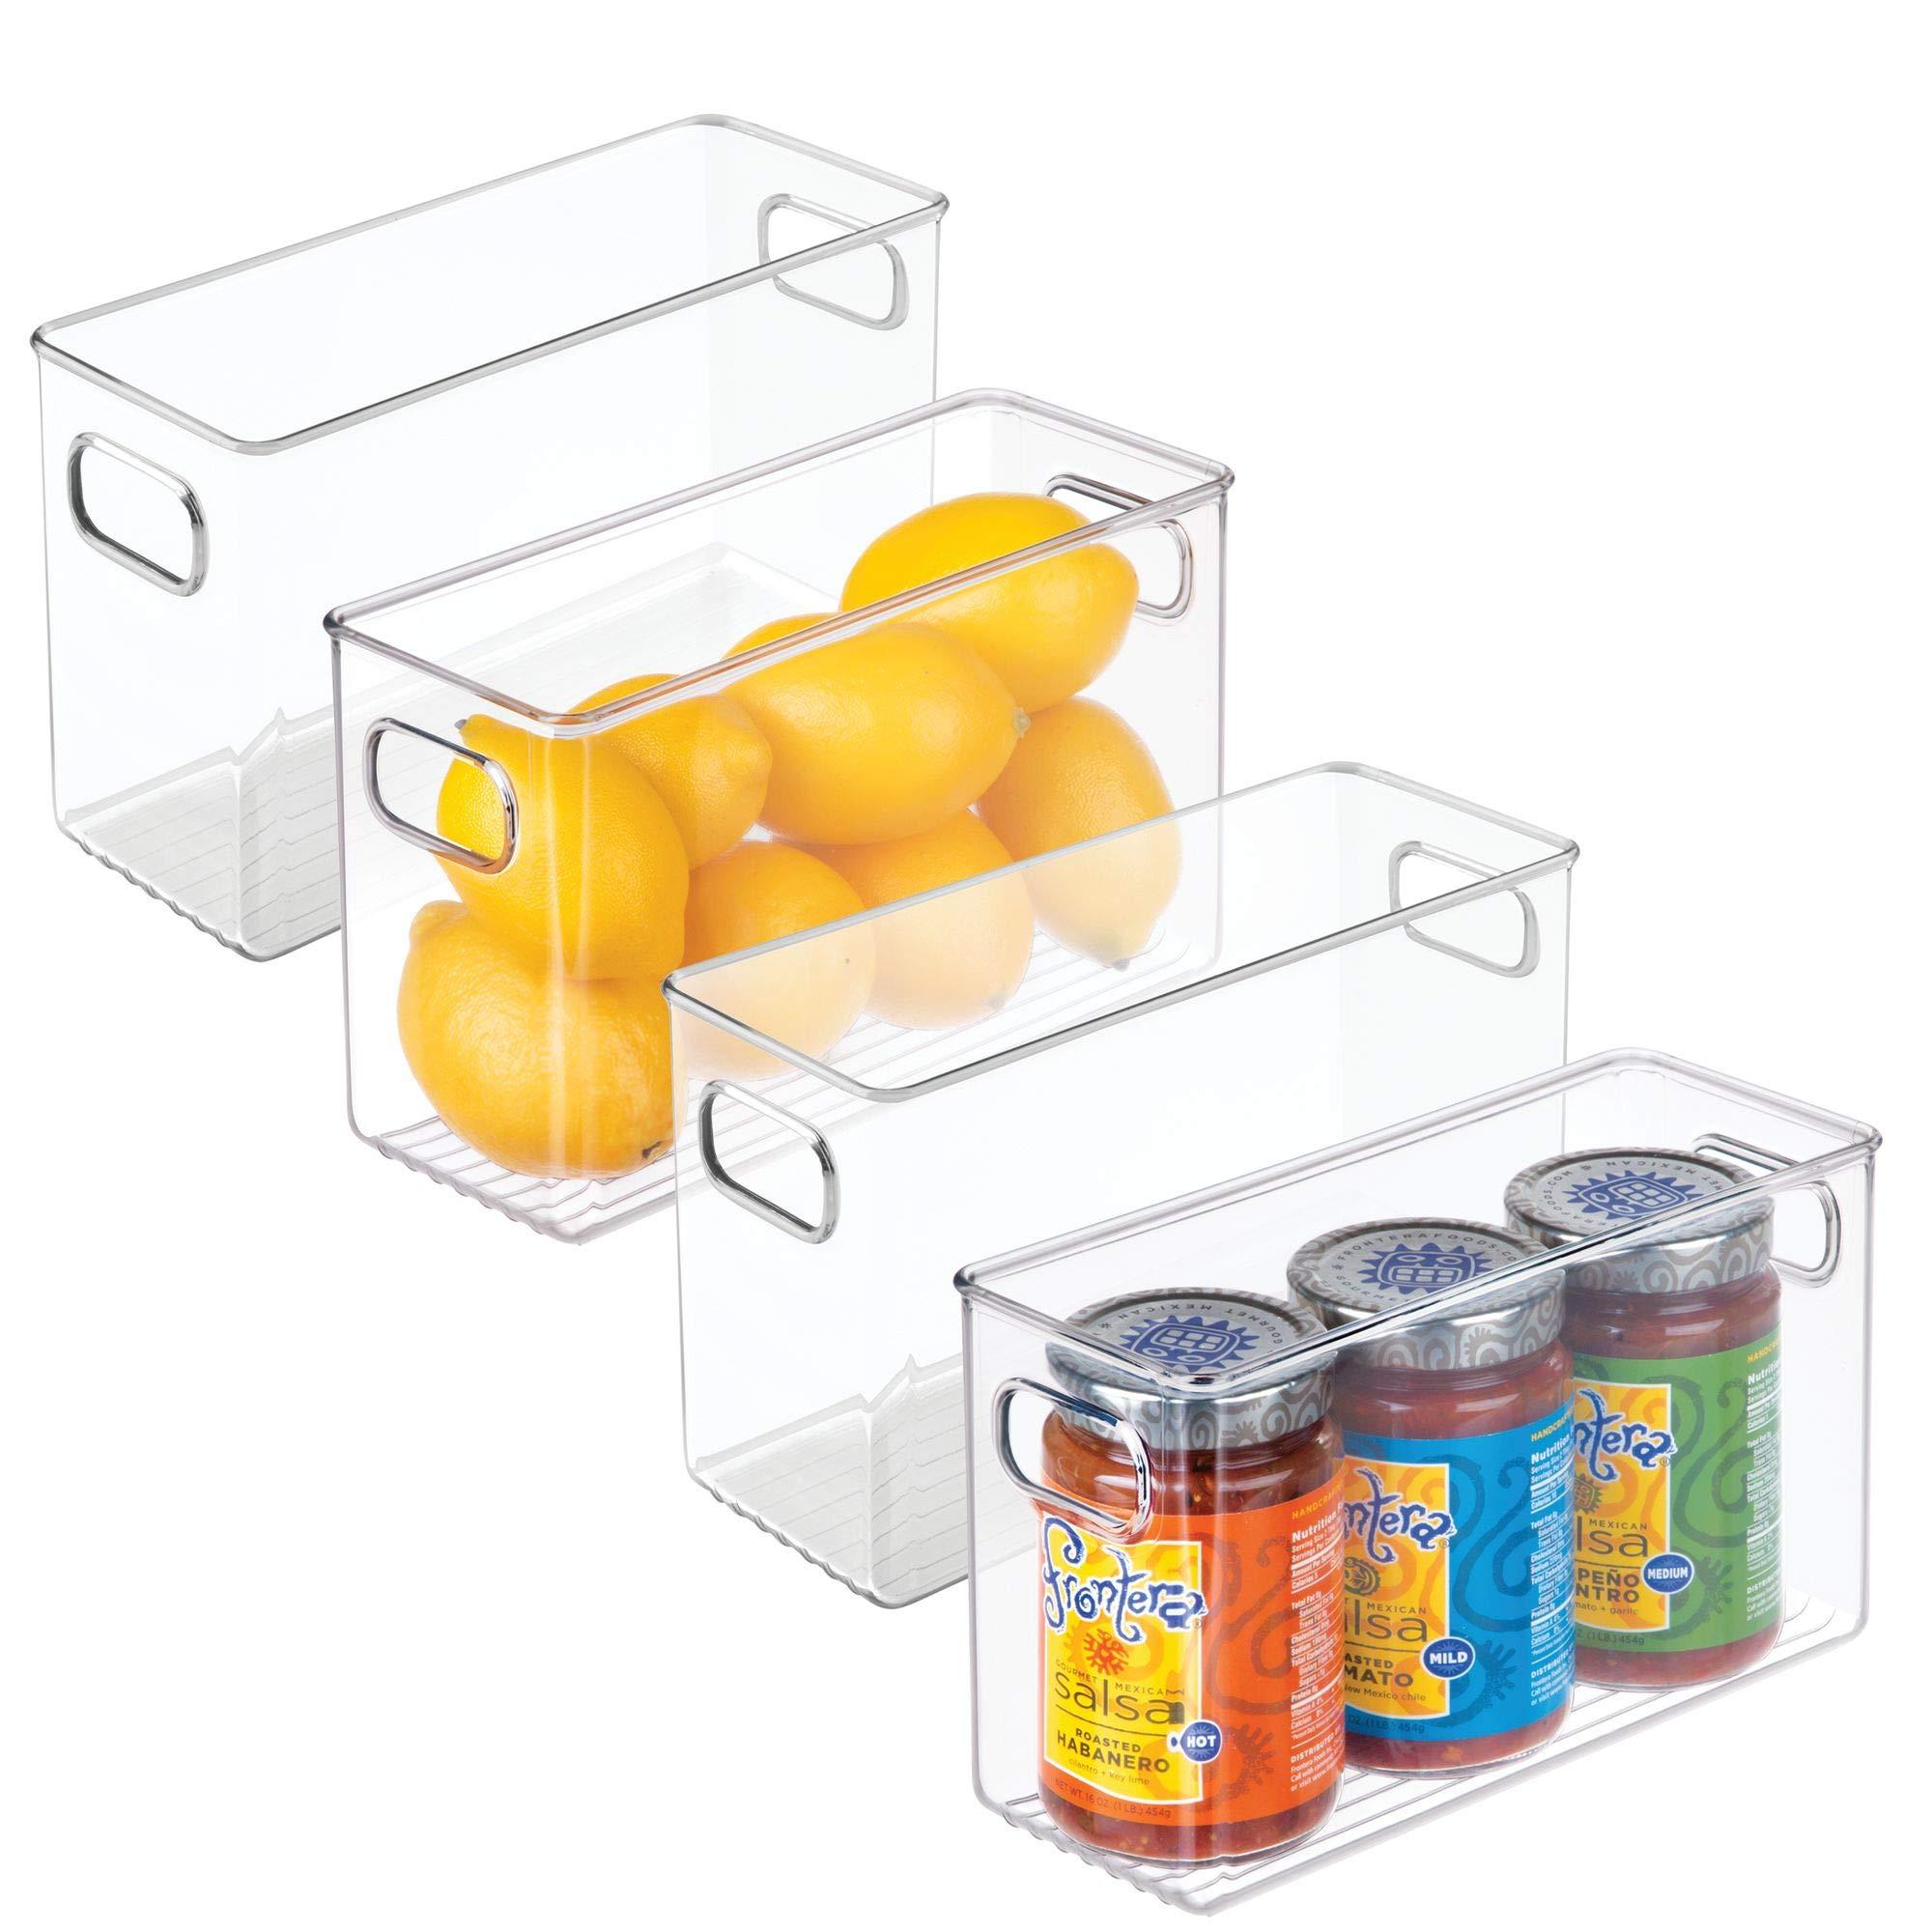 mDesign Plastic Kitchen Pantry Cabinet, Refrigerator or Freezer Food Storage Bins with Handles - Organizer for Fruit, Yogurt, Snacks, Pasta - Food Safe, BPA Free, 10'' Long - 4 Pack, Clear